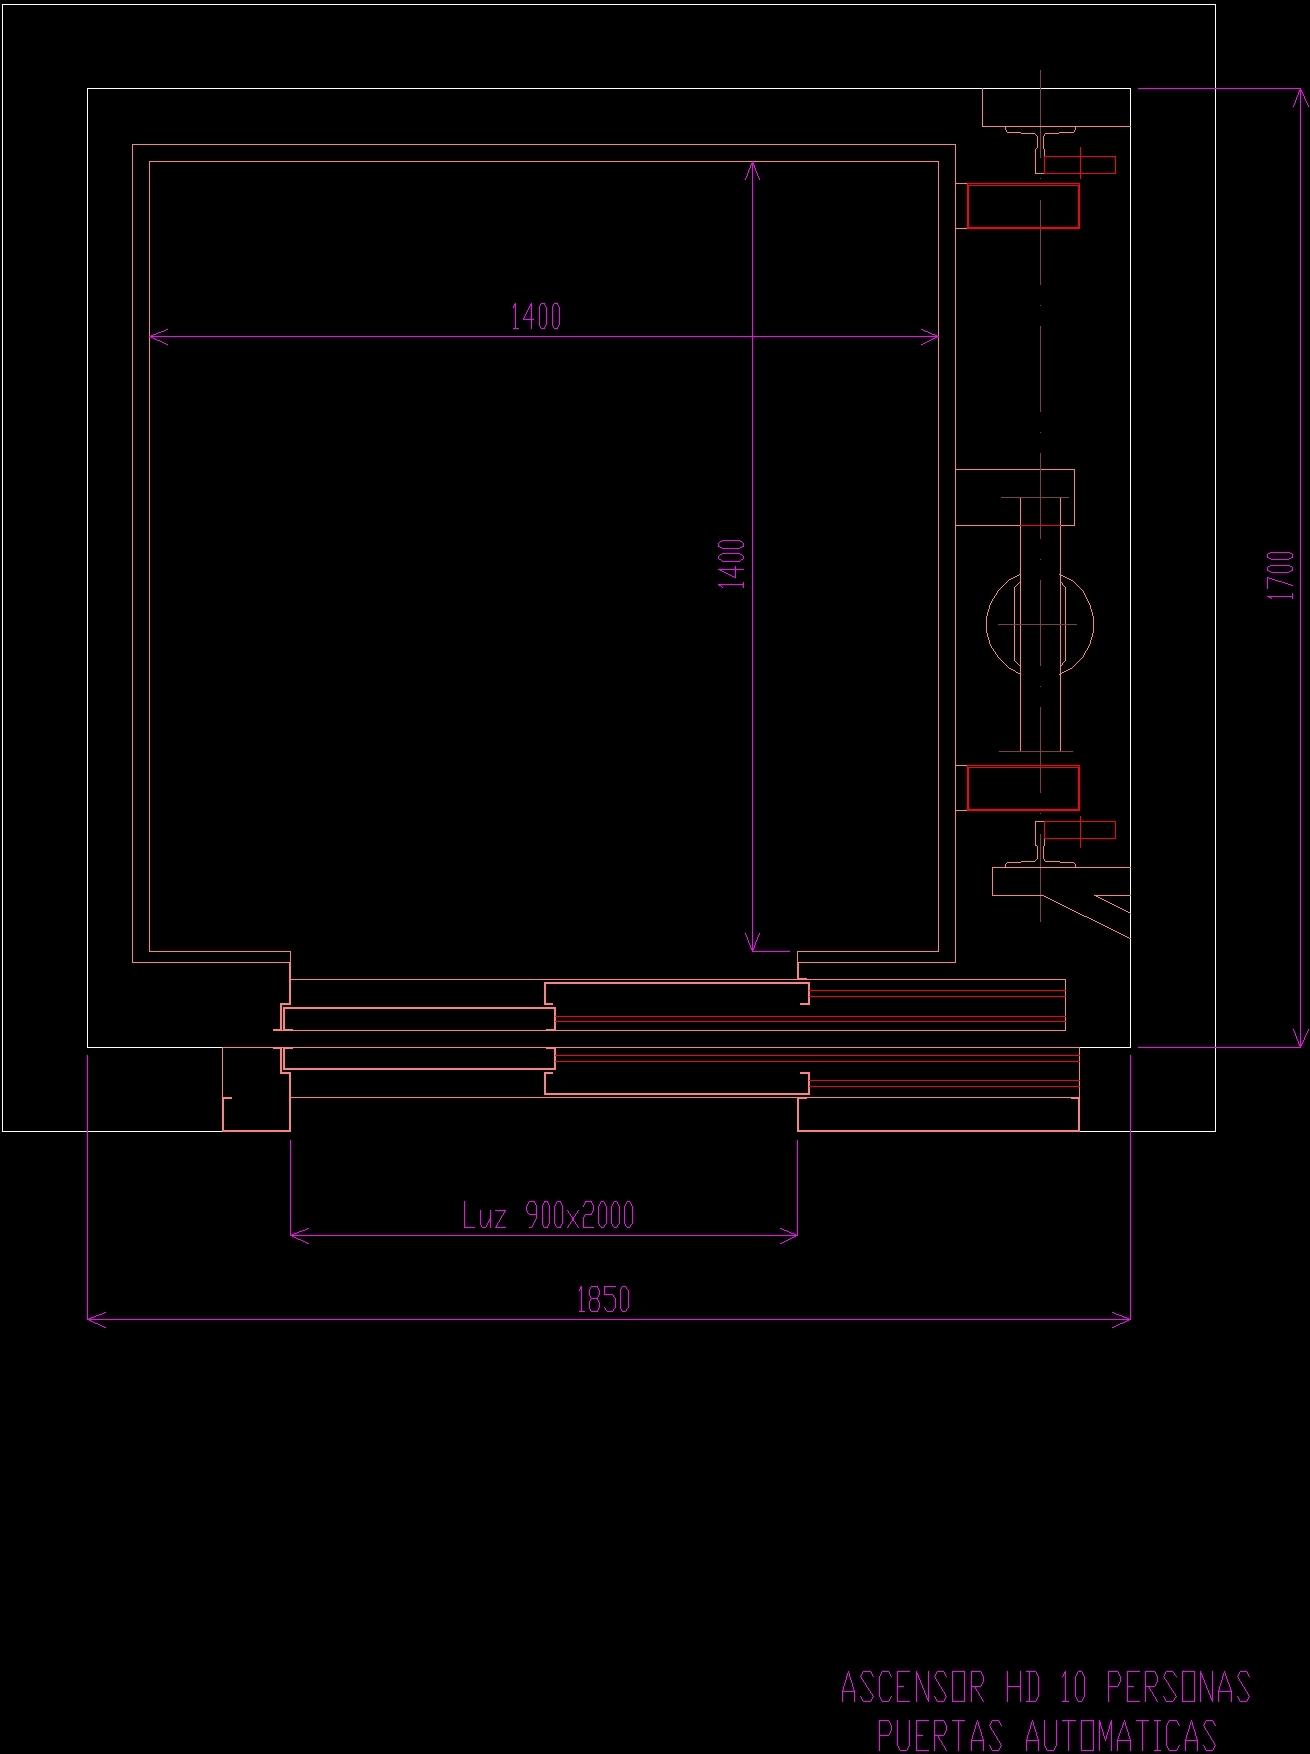 Autocad 3d House Design Software: Elevators DWG Block For AutoCAD